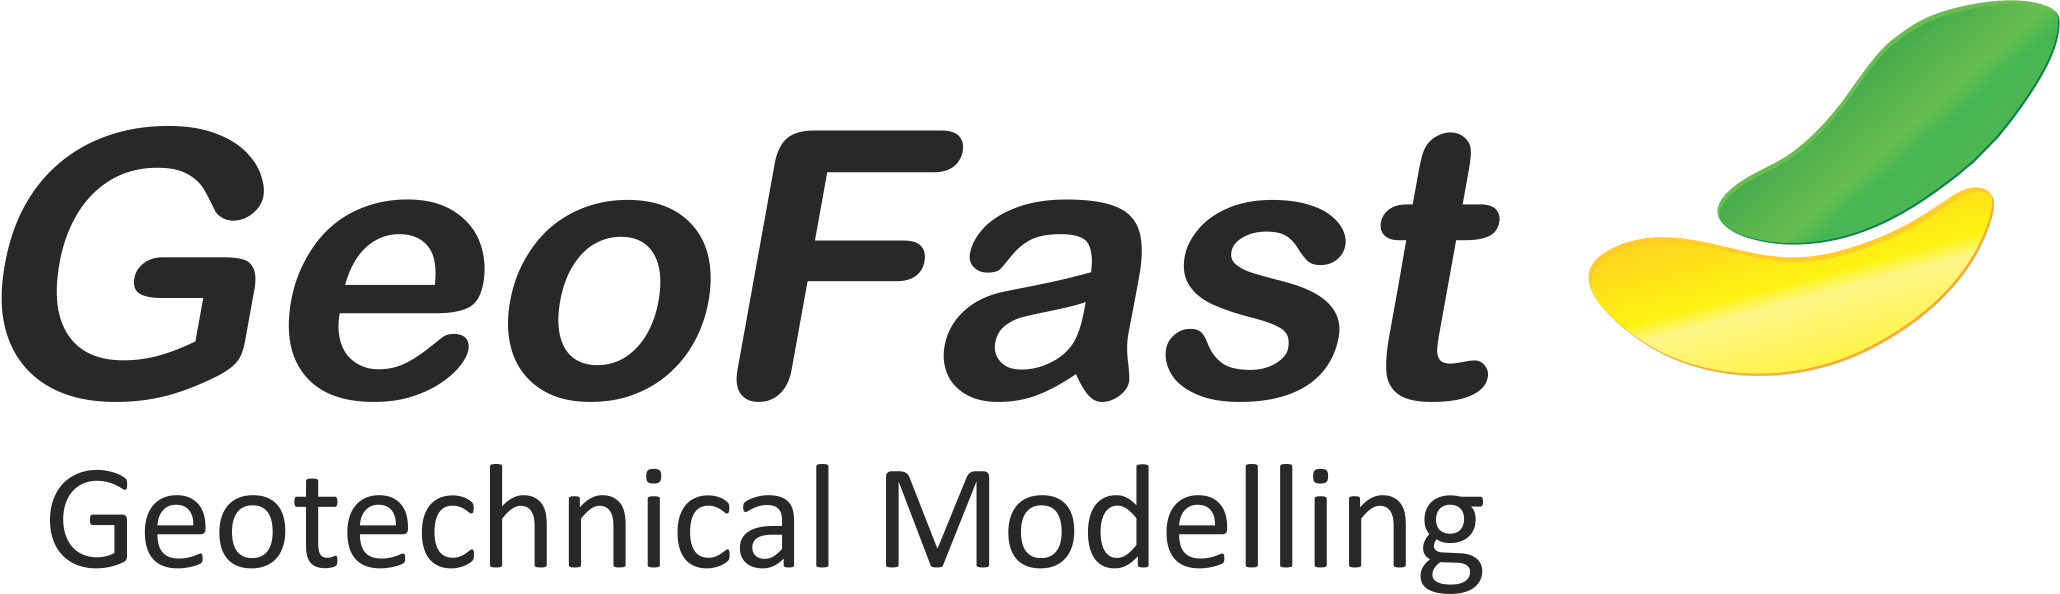 Geotechnical Modelling - Sem Fundo